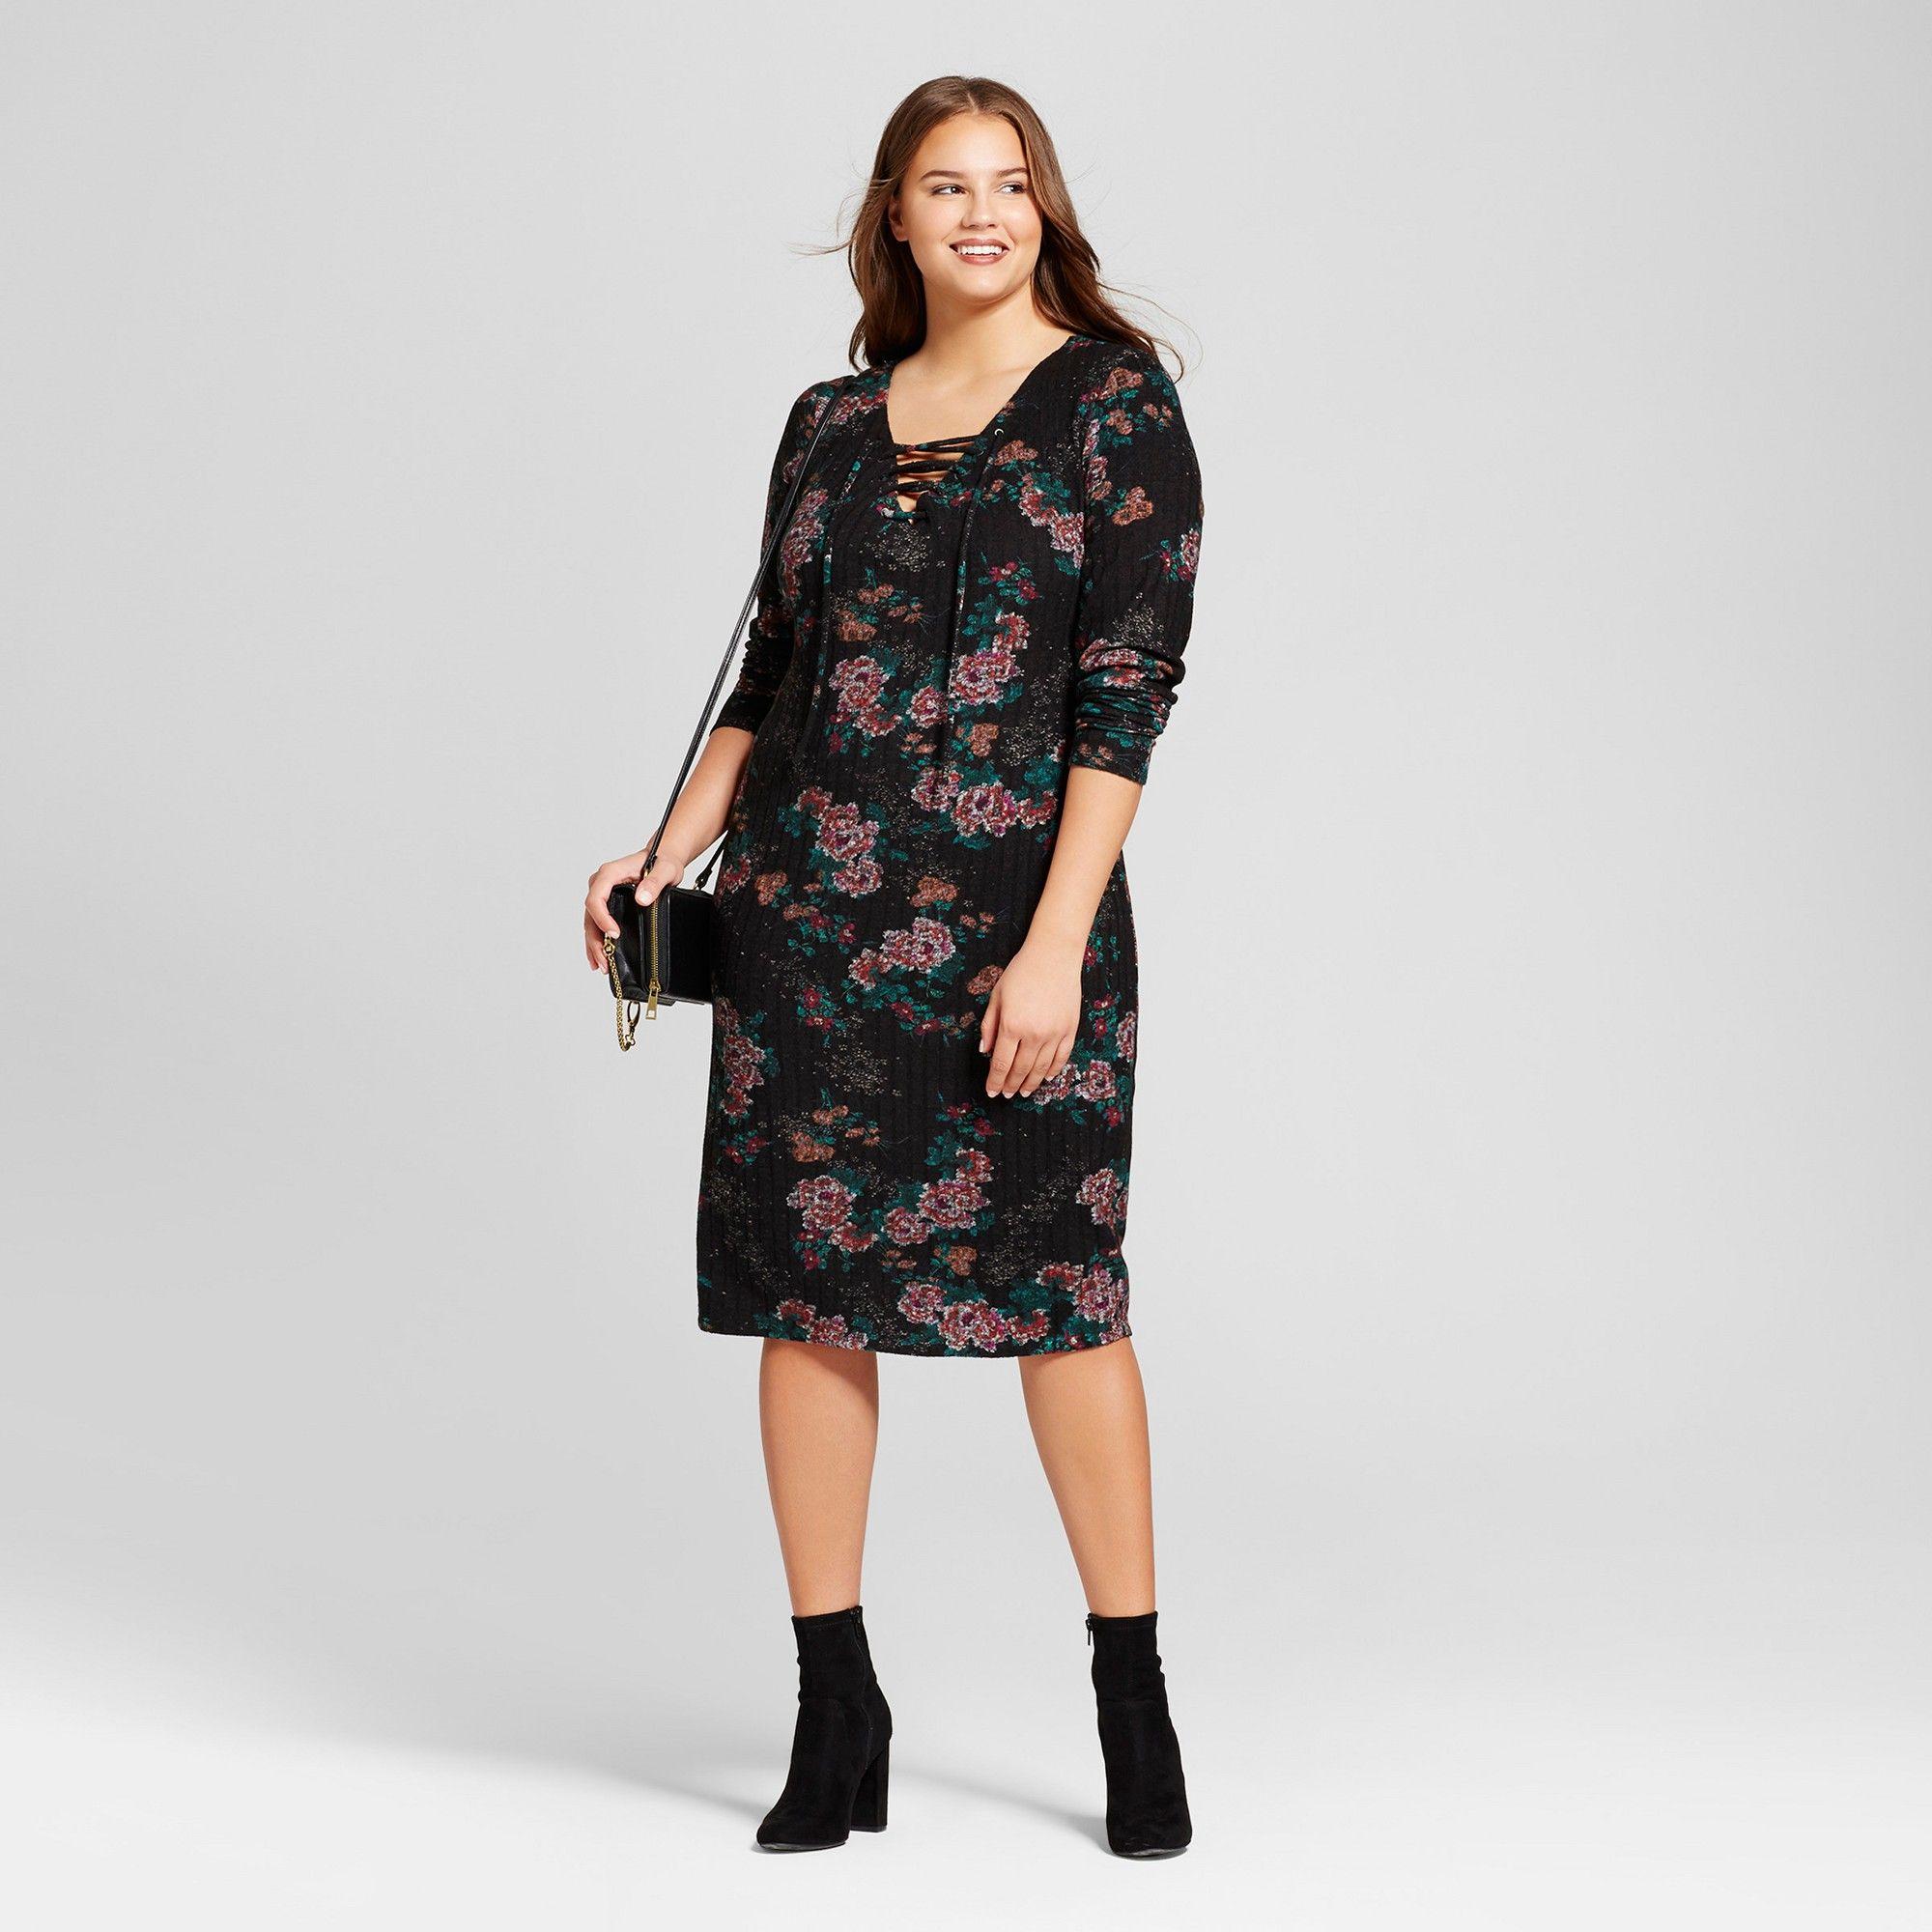 108b8120f3 Women s Plus Size Cozy Floral Print Lace Up Dress - Xhilaration Black 3X